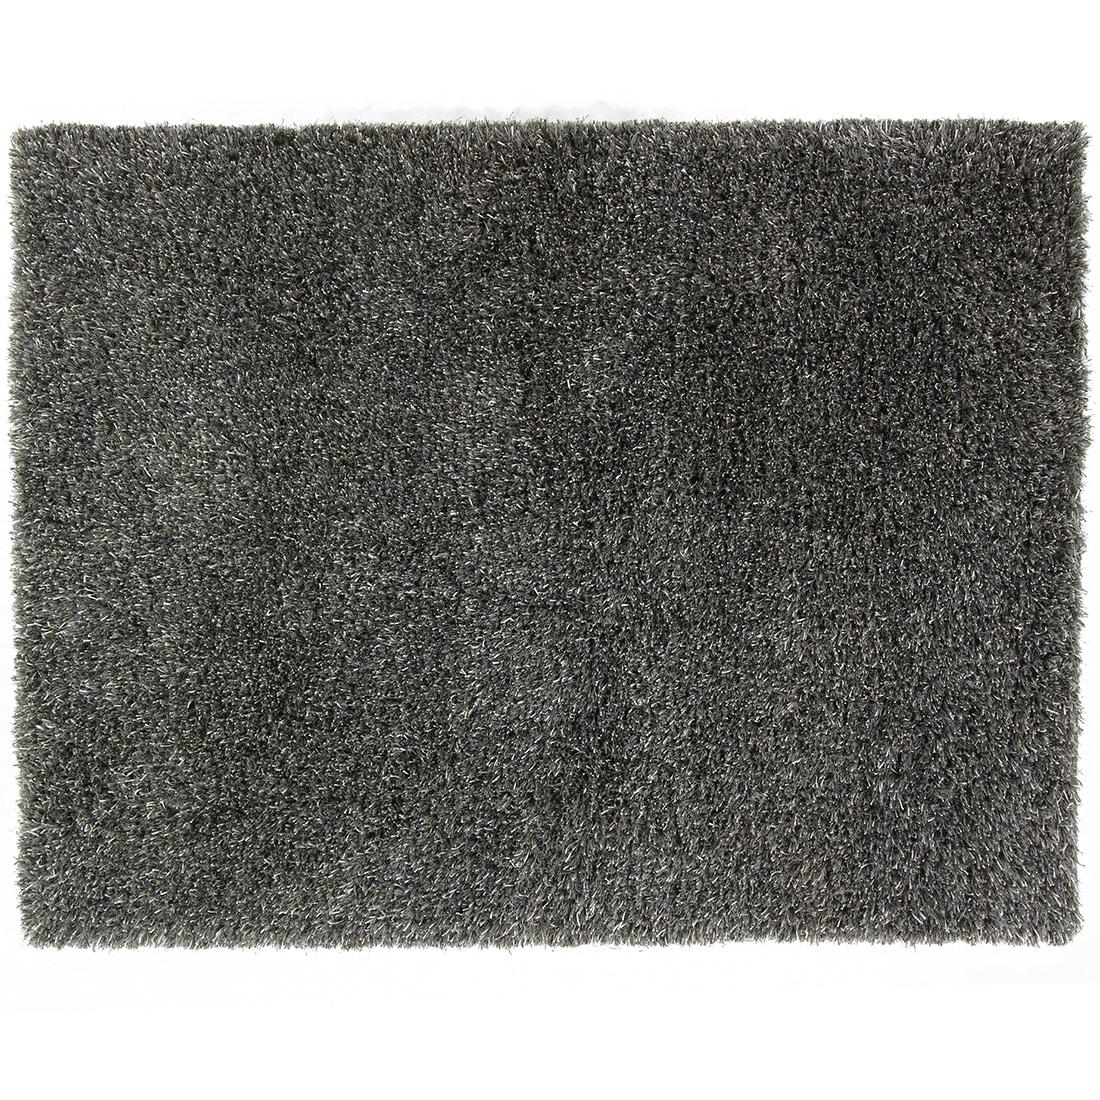 Vloerkleed Brinker Paulo Grey Mix | 170 x 230 cm